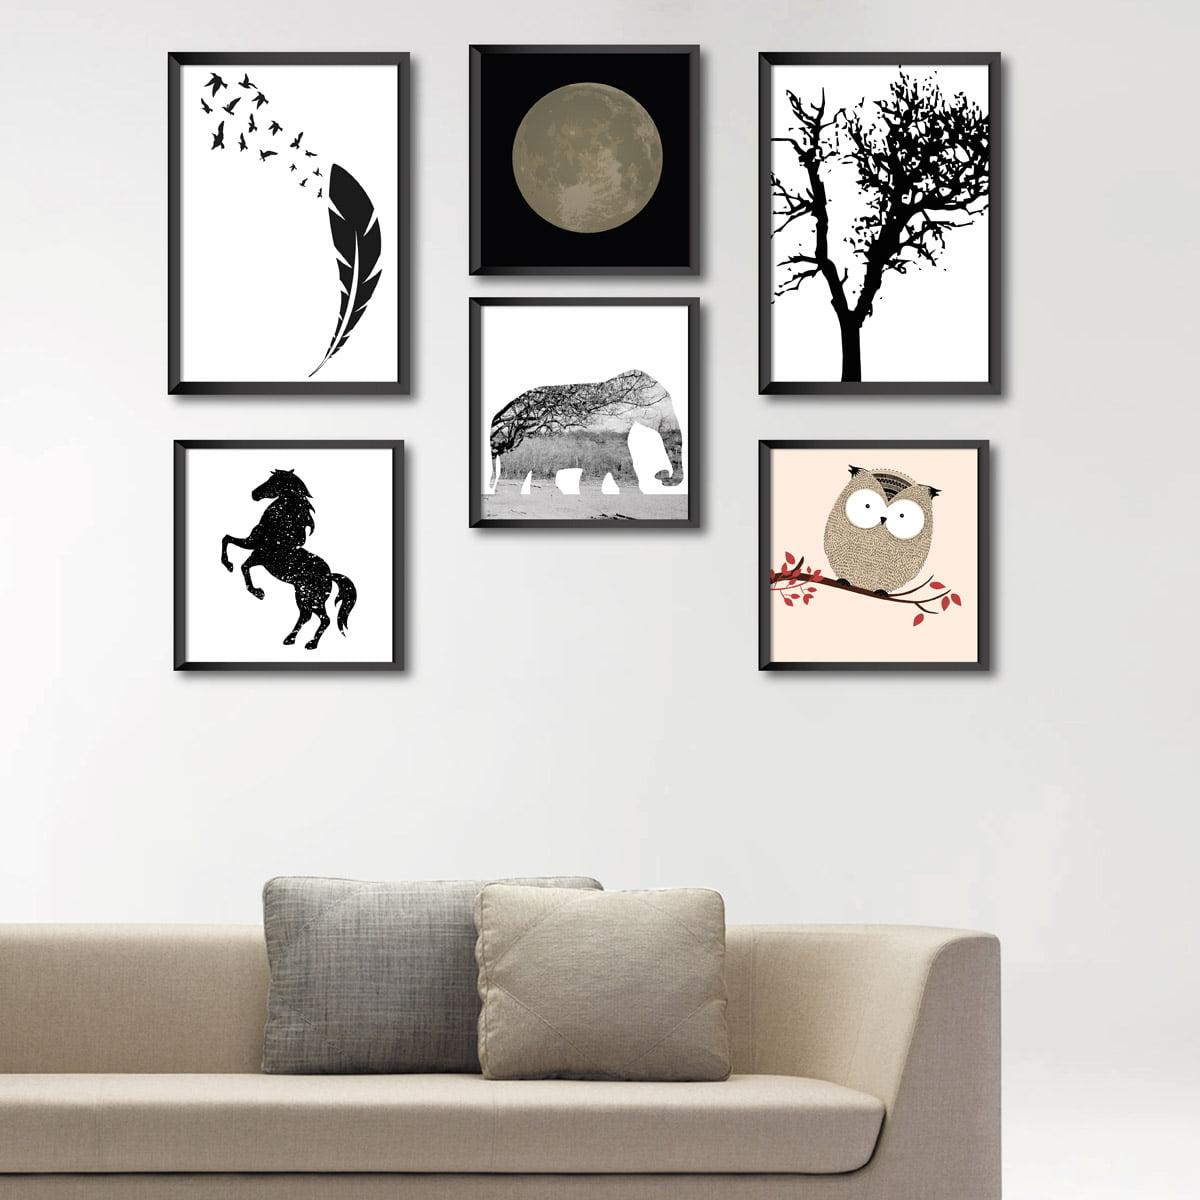 Kit Conjunto 6  Quadros Decorativos Elefante, Cavalo e Arvore